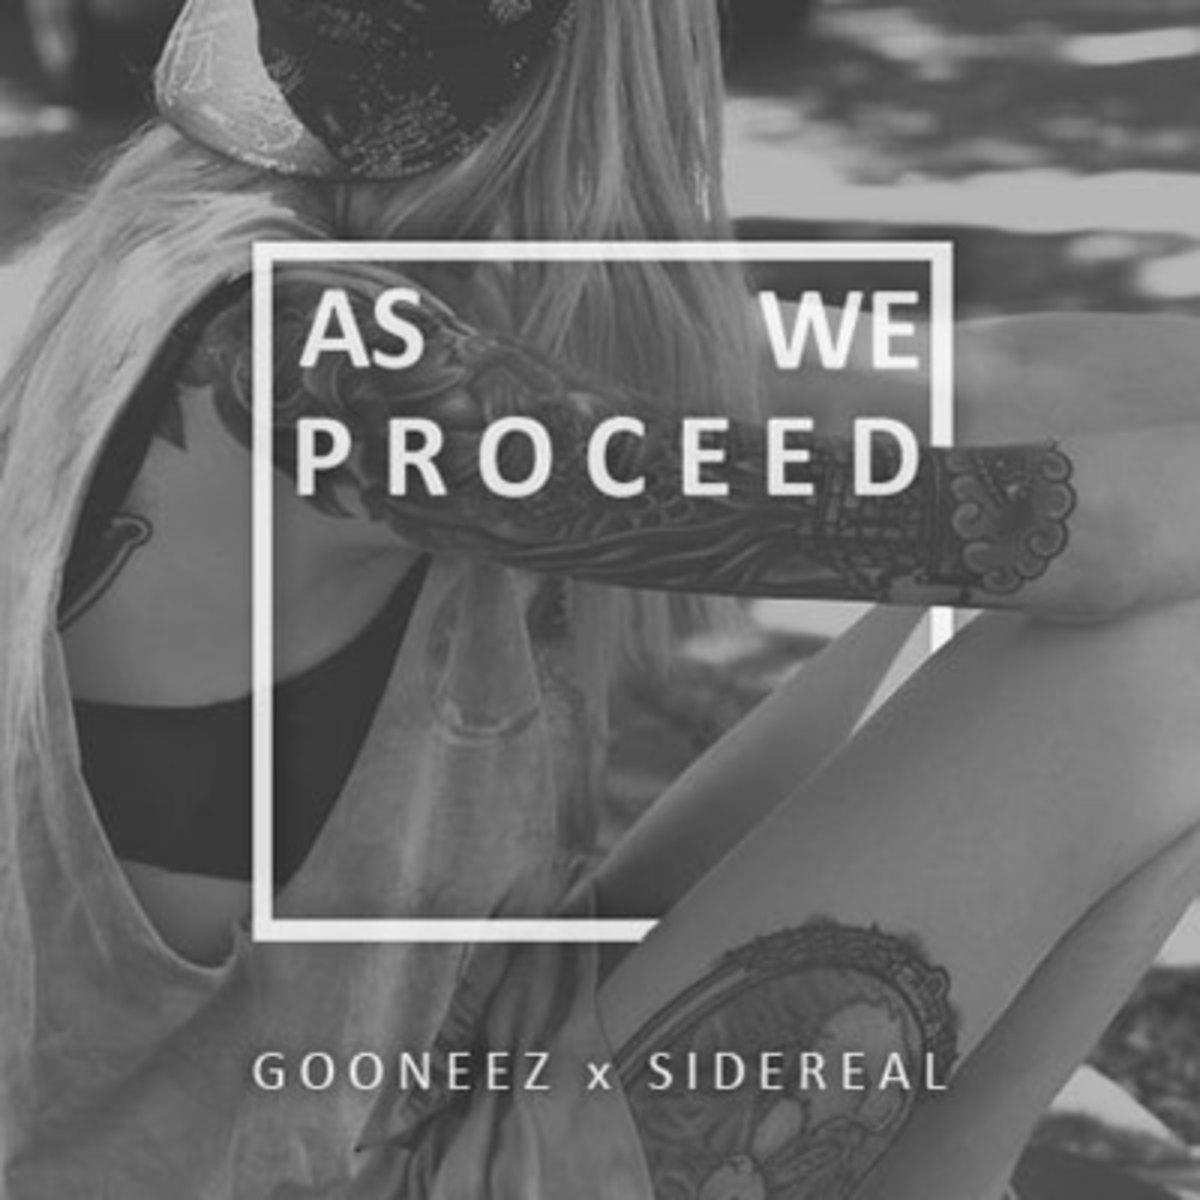 sidereal-asweproceed.jpg